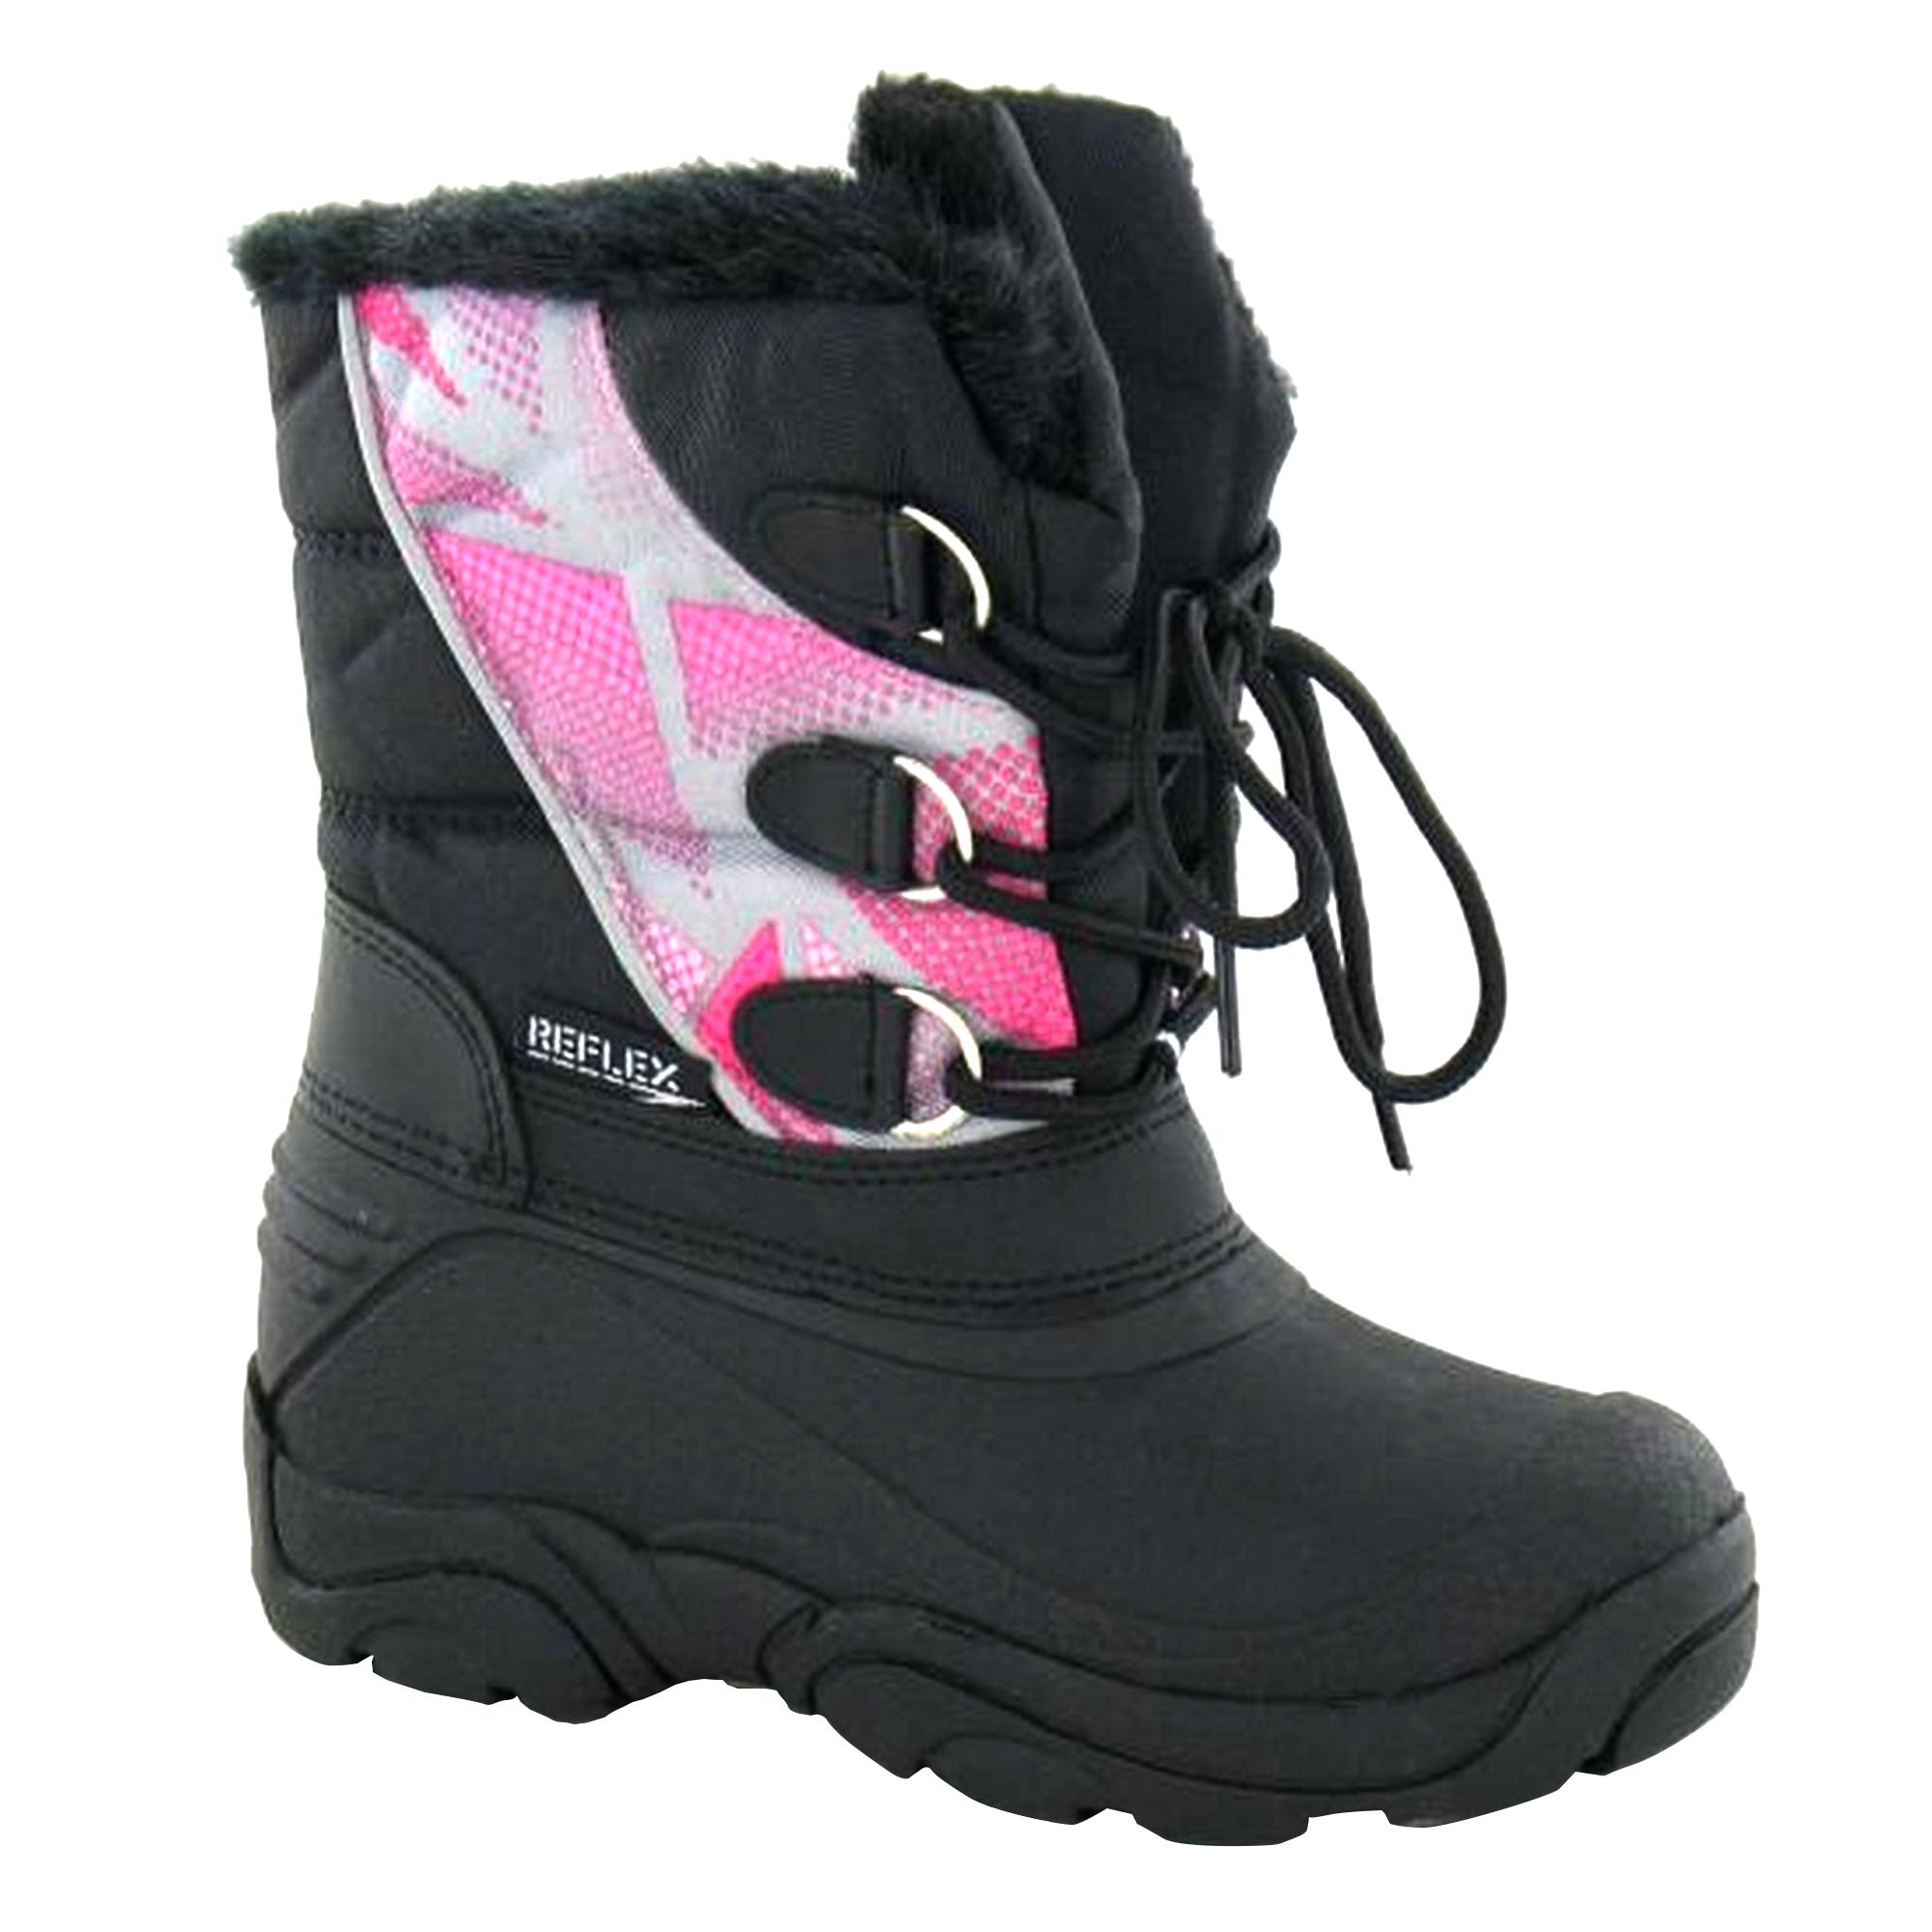 Cutie-Childrens-Girls-Faux-Fur-Snow-Boots-KM588